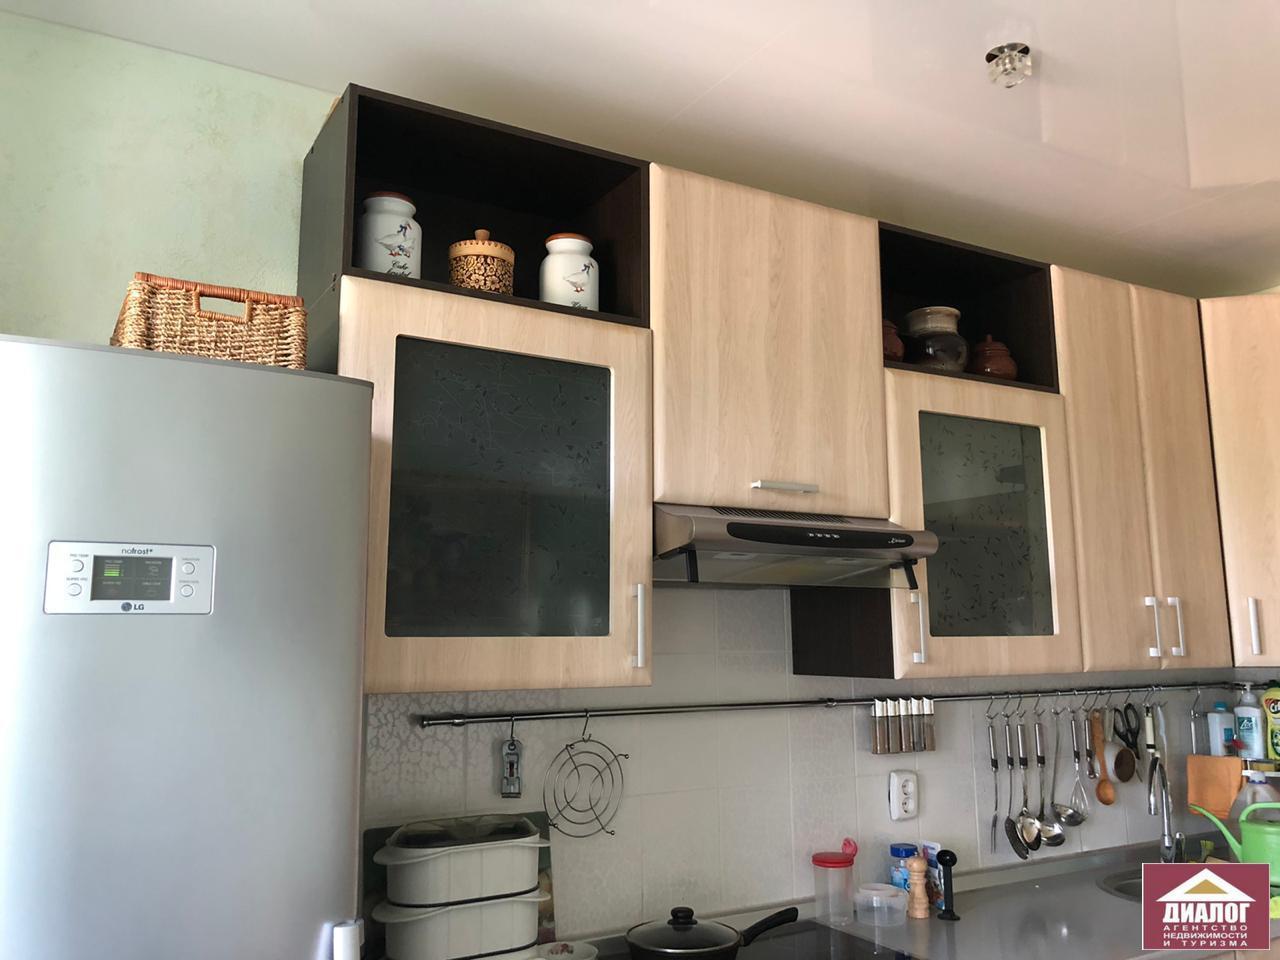 Аренда 2-комнатной квартиры, г. Тольятти, Фрунзе улица  дом 10Б